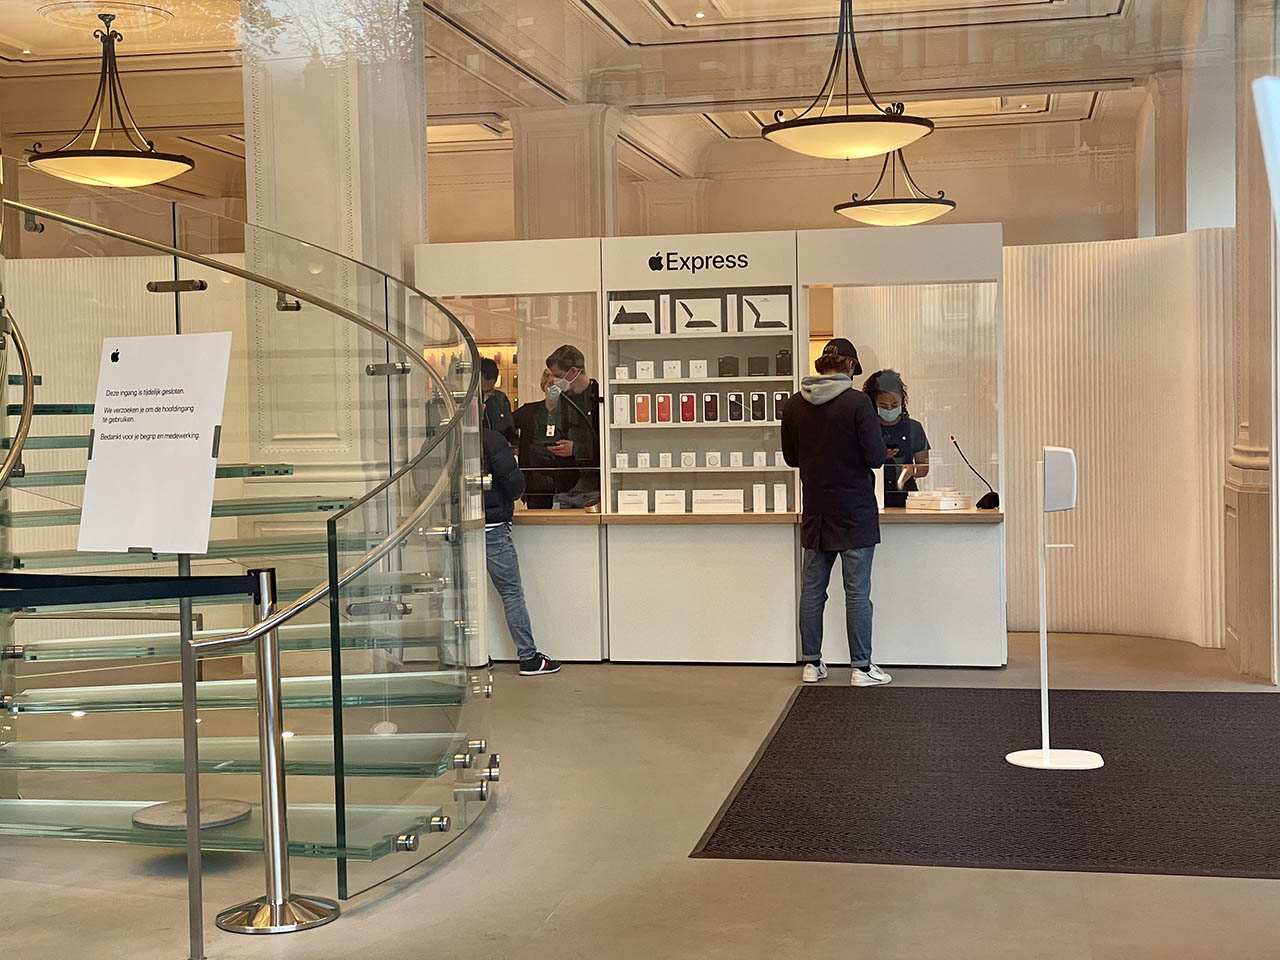 Express-loket bij Apple Amsterdam